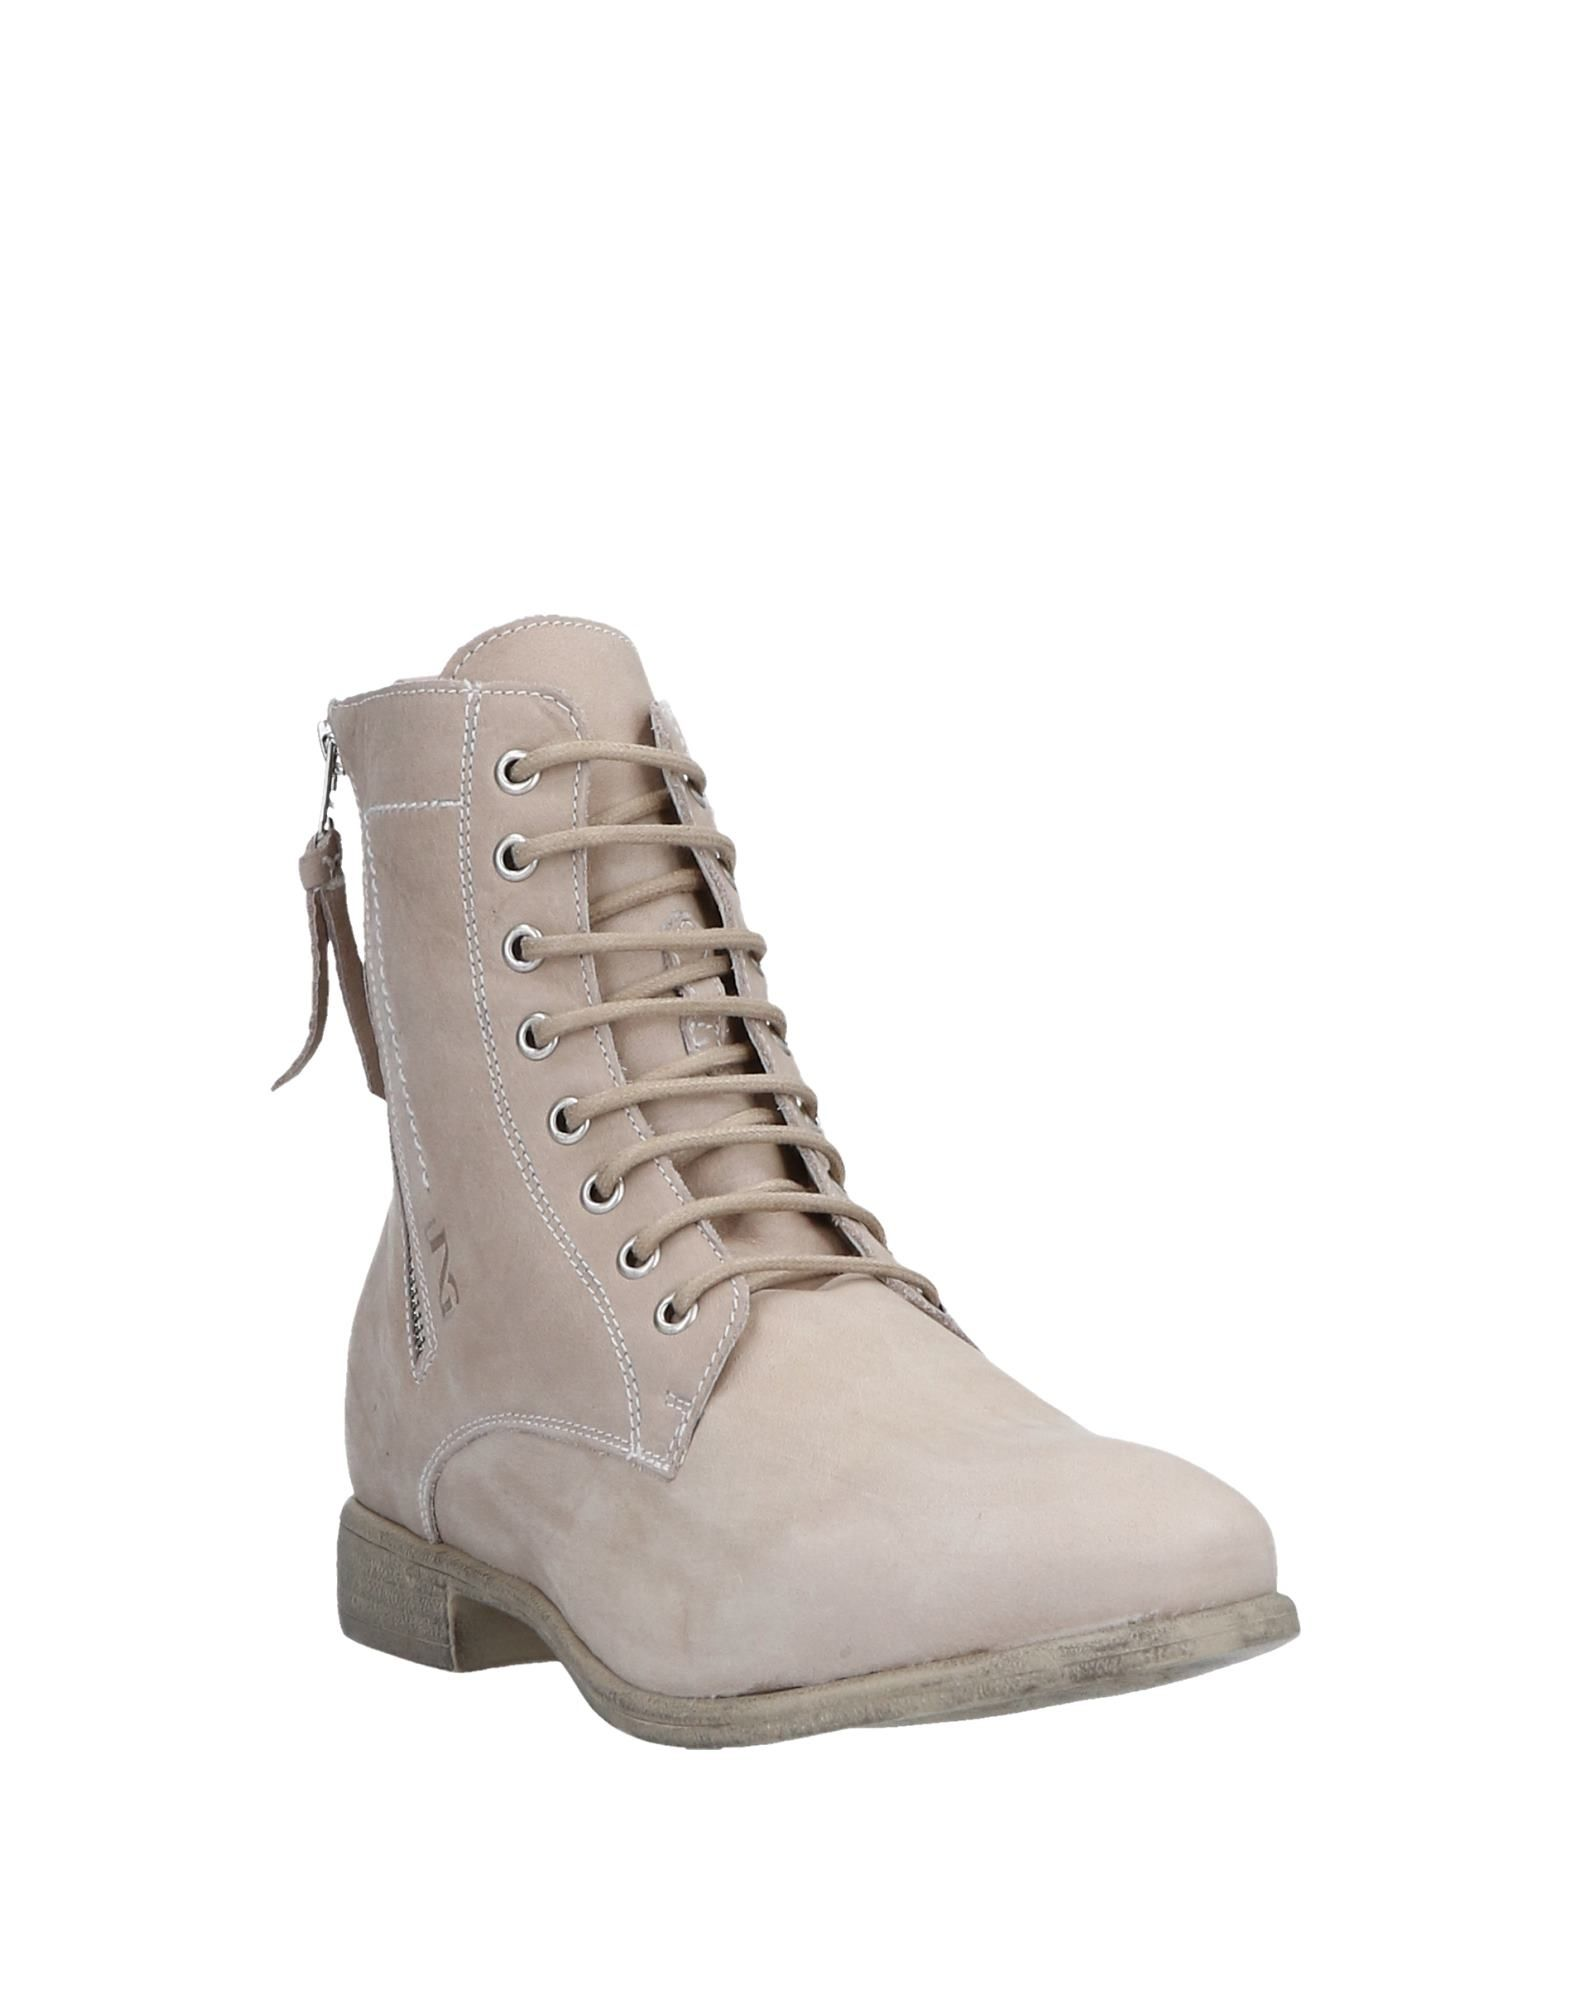 Nero Giardini Gute Stiefelette Damen  11531415NL Gute Giardini Qualität beliebte Schuhe 5526b4